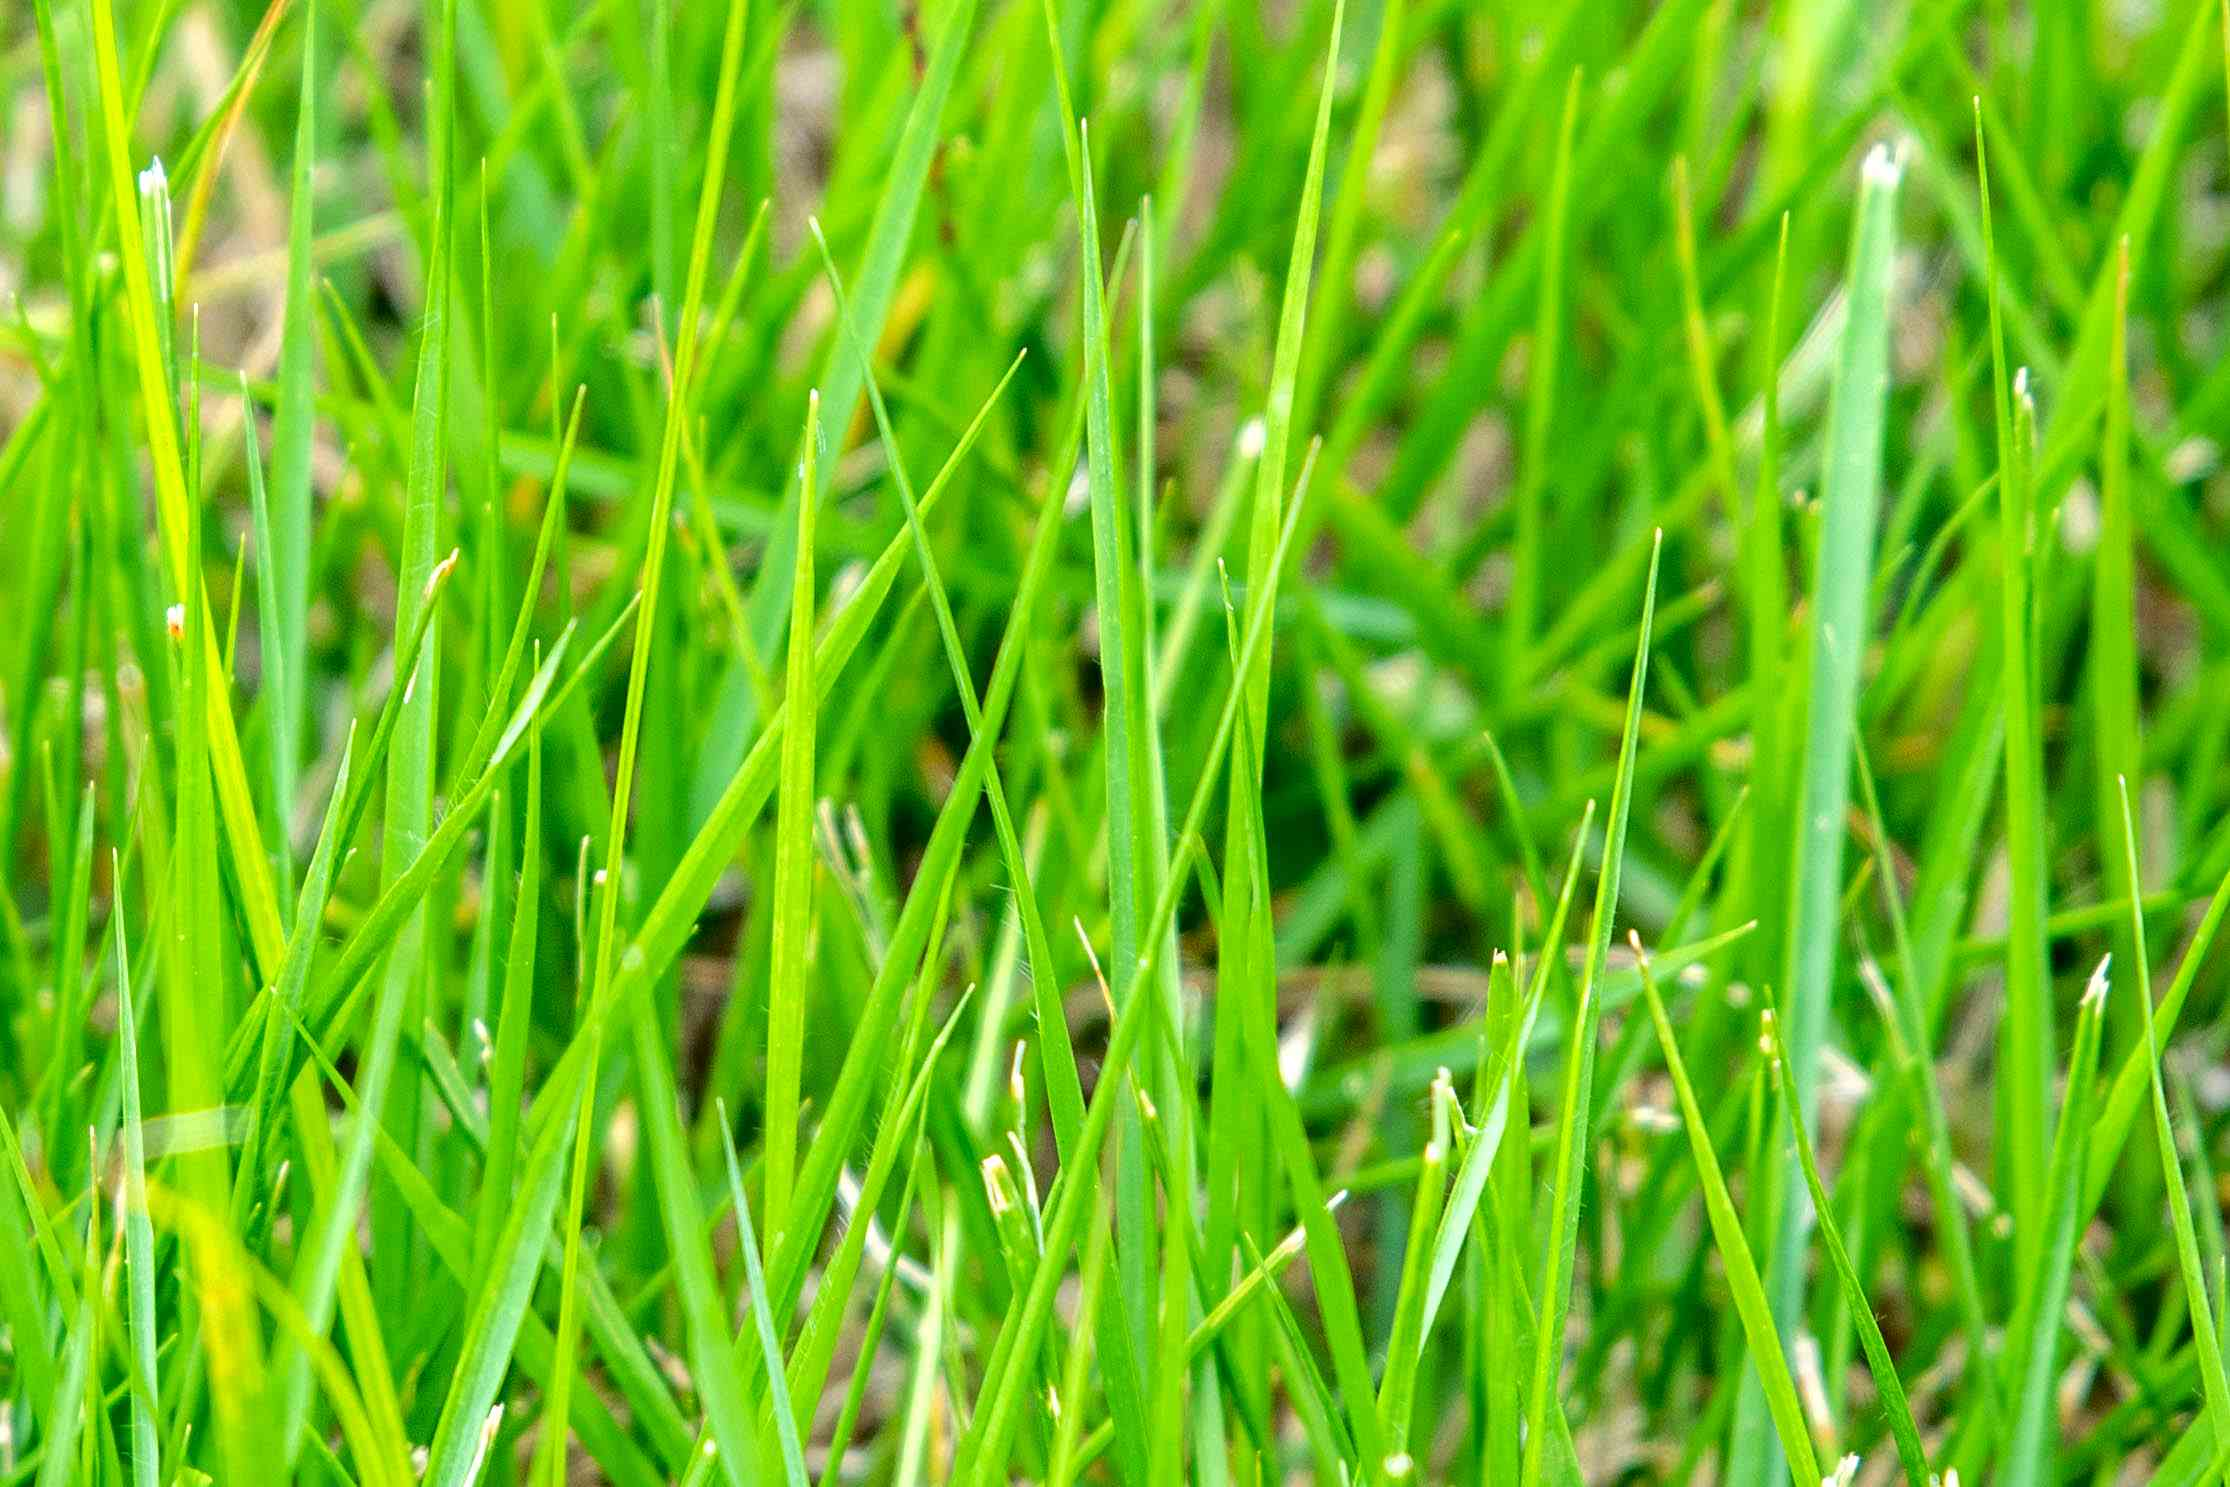 Zoysia grass bright green blades closeup